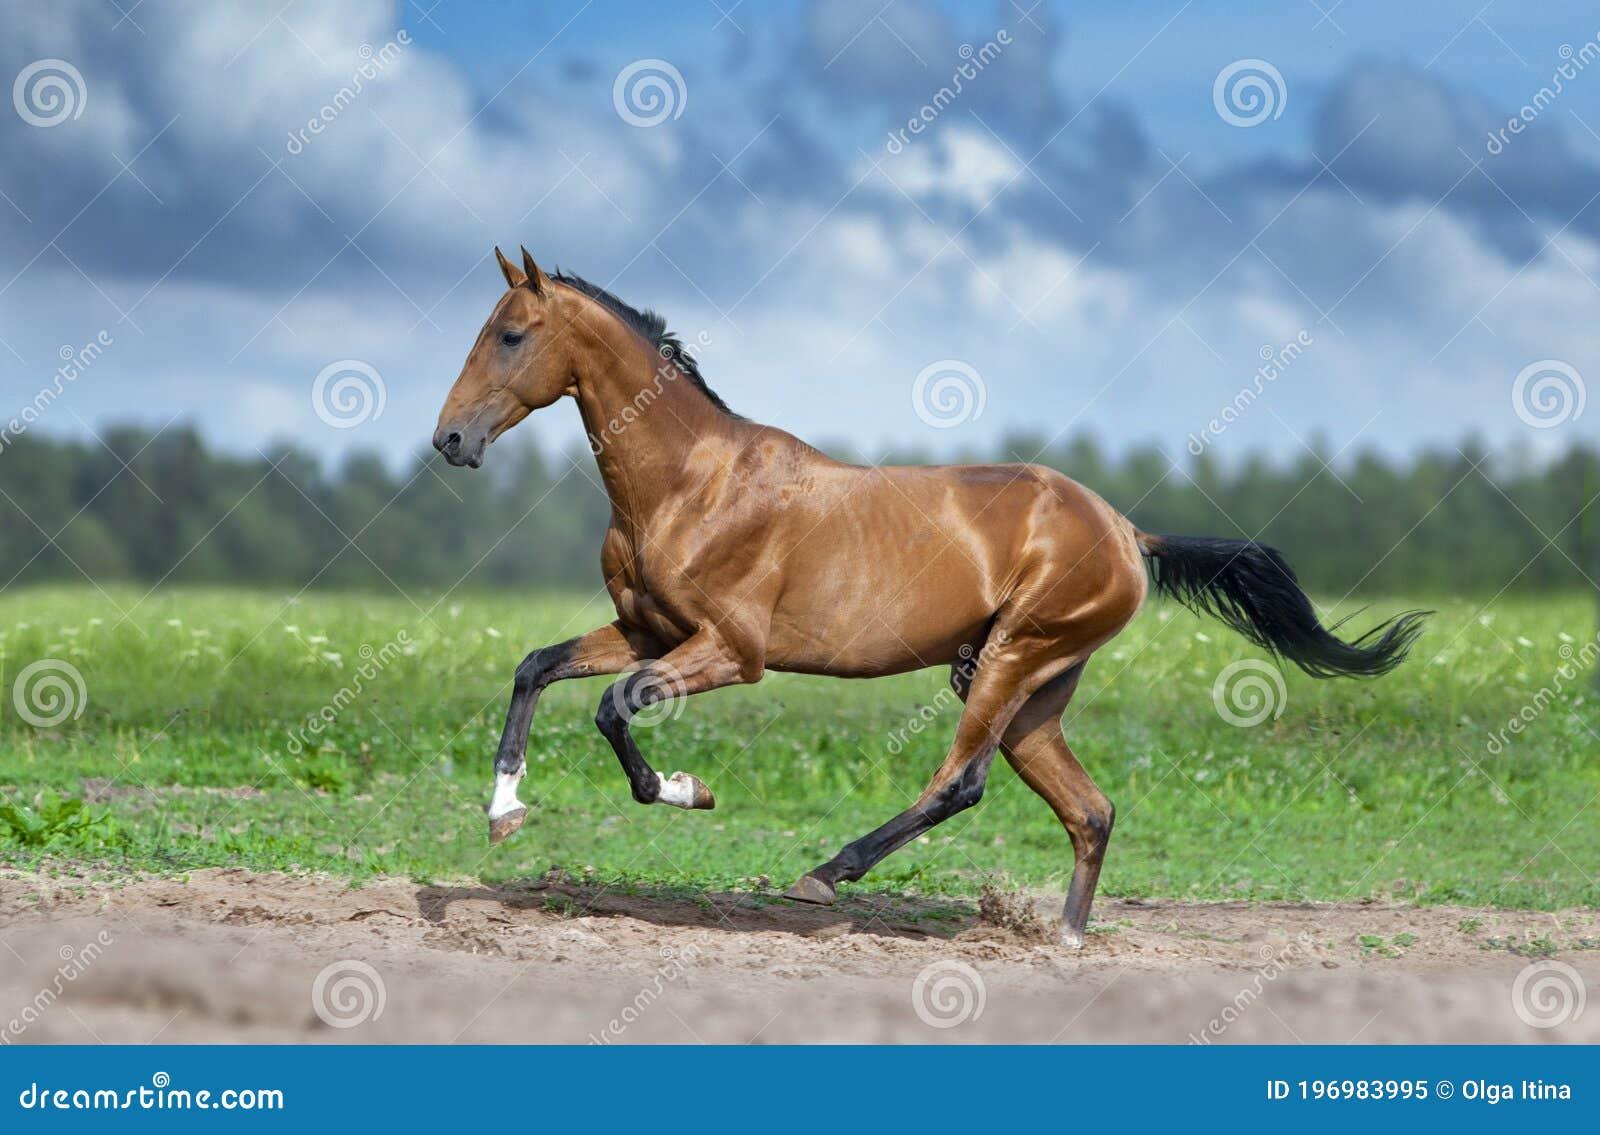 Golden Bay Akhal Teke Horse Running In Desert Stock Image Image Of Gallop Freedom 196983995